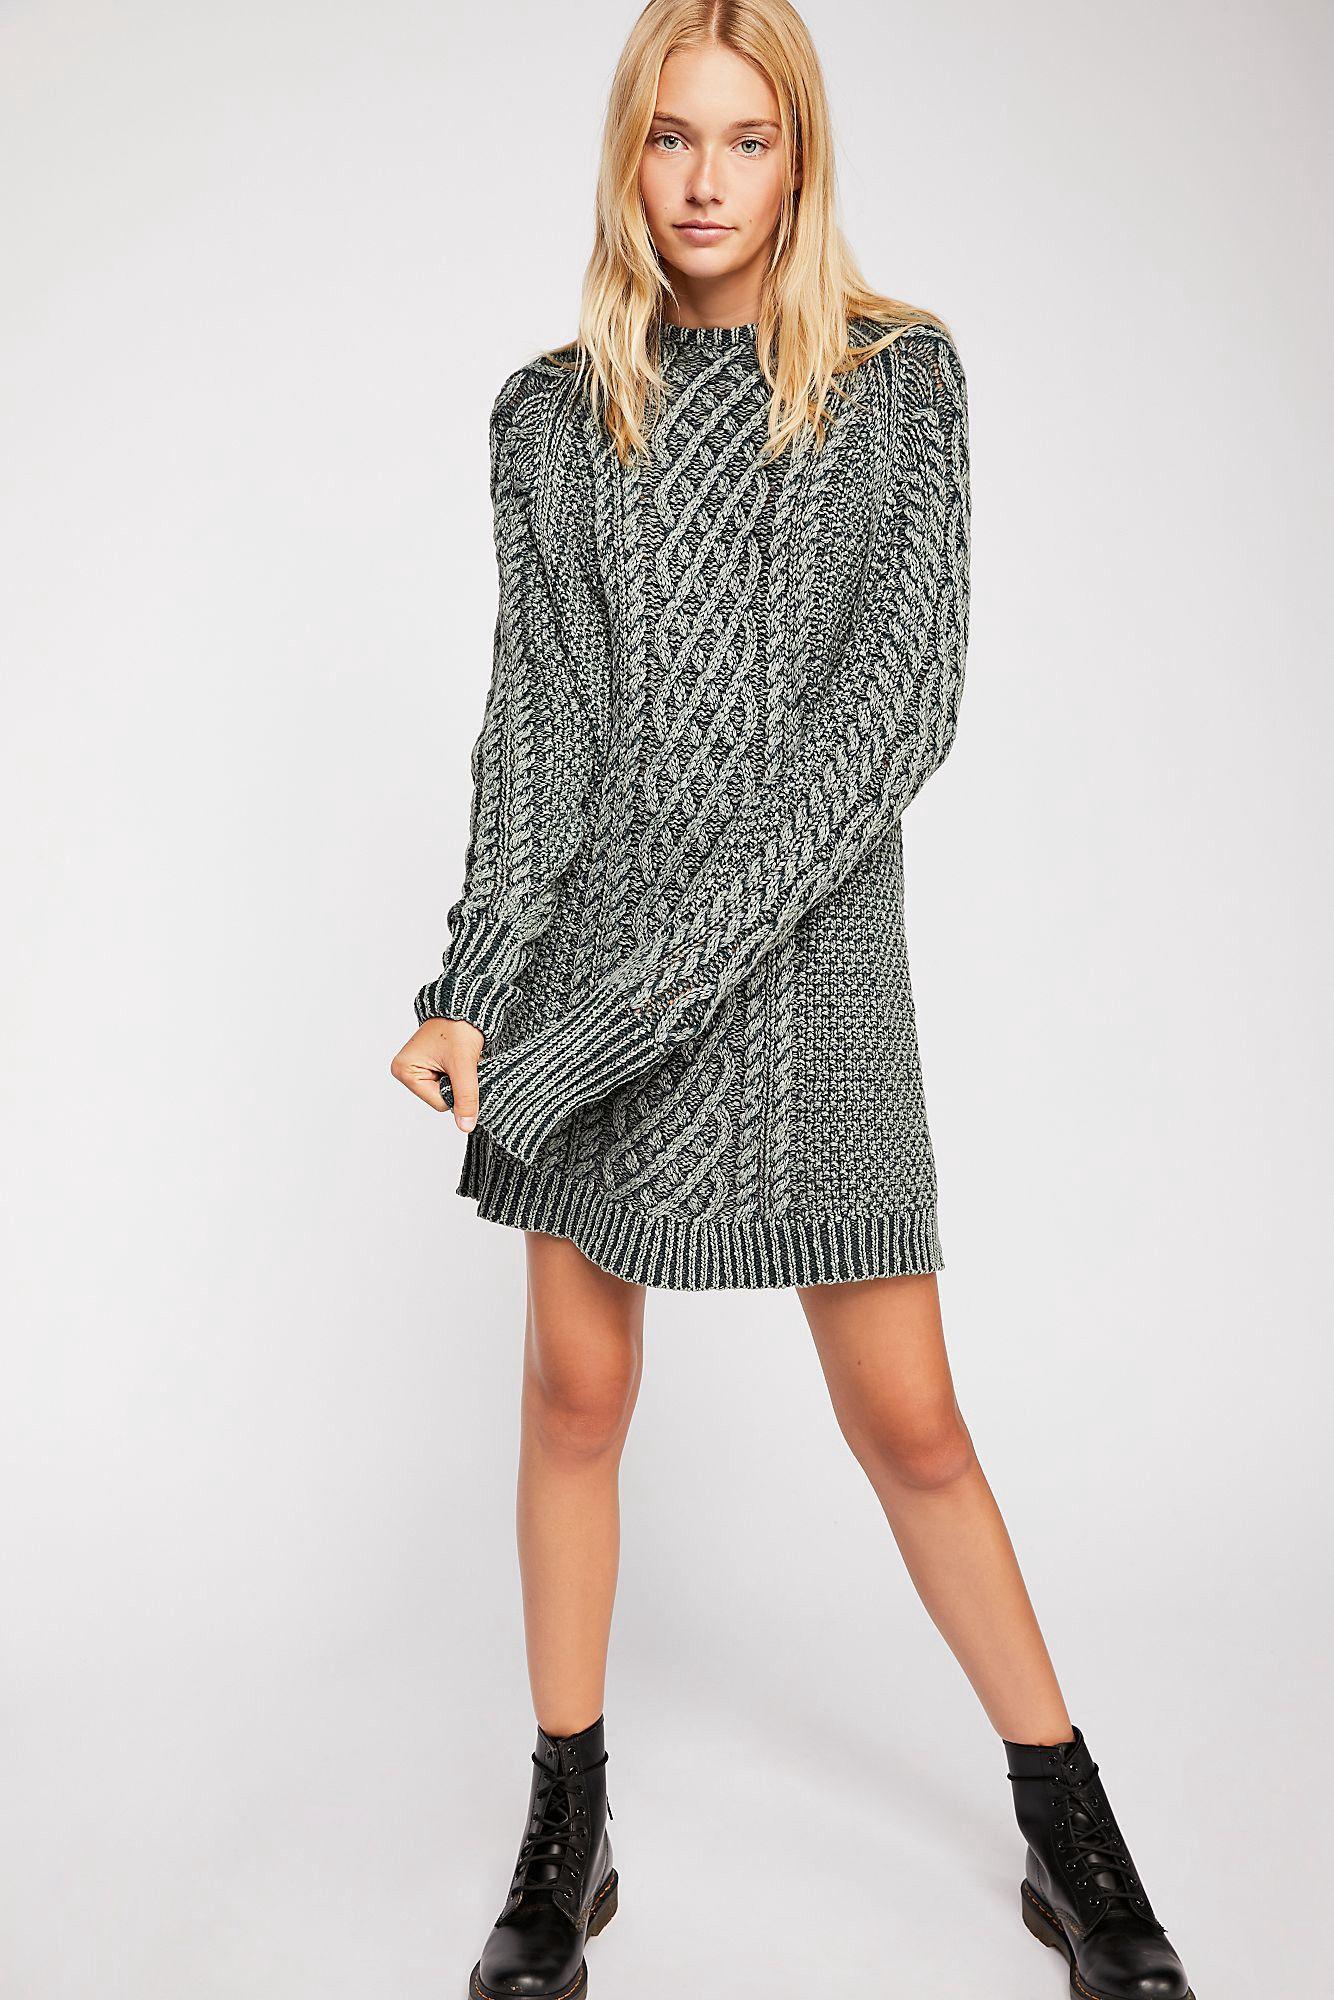 c727f63038655 Free People On A Boat Sweater Dress - Jewel Seas Xs